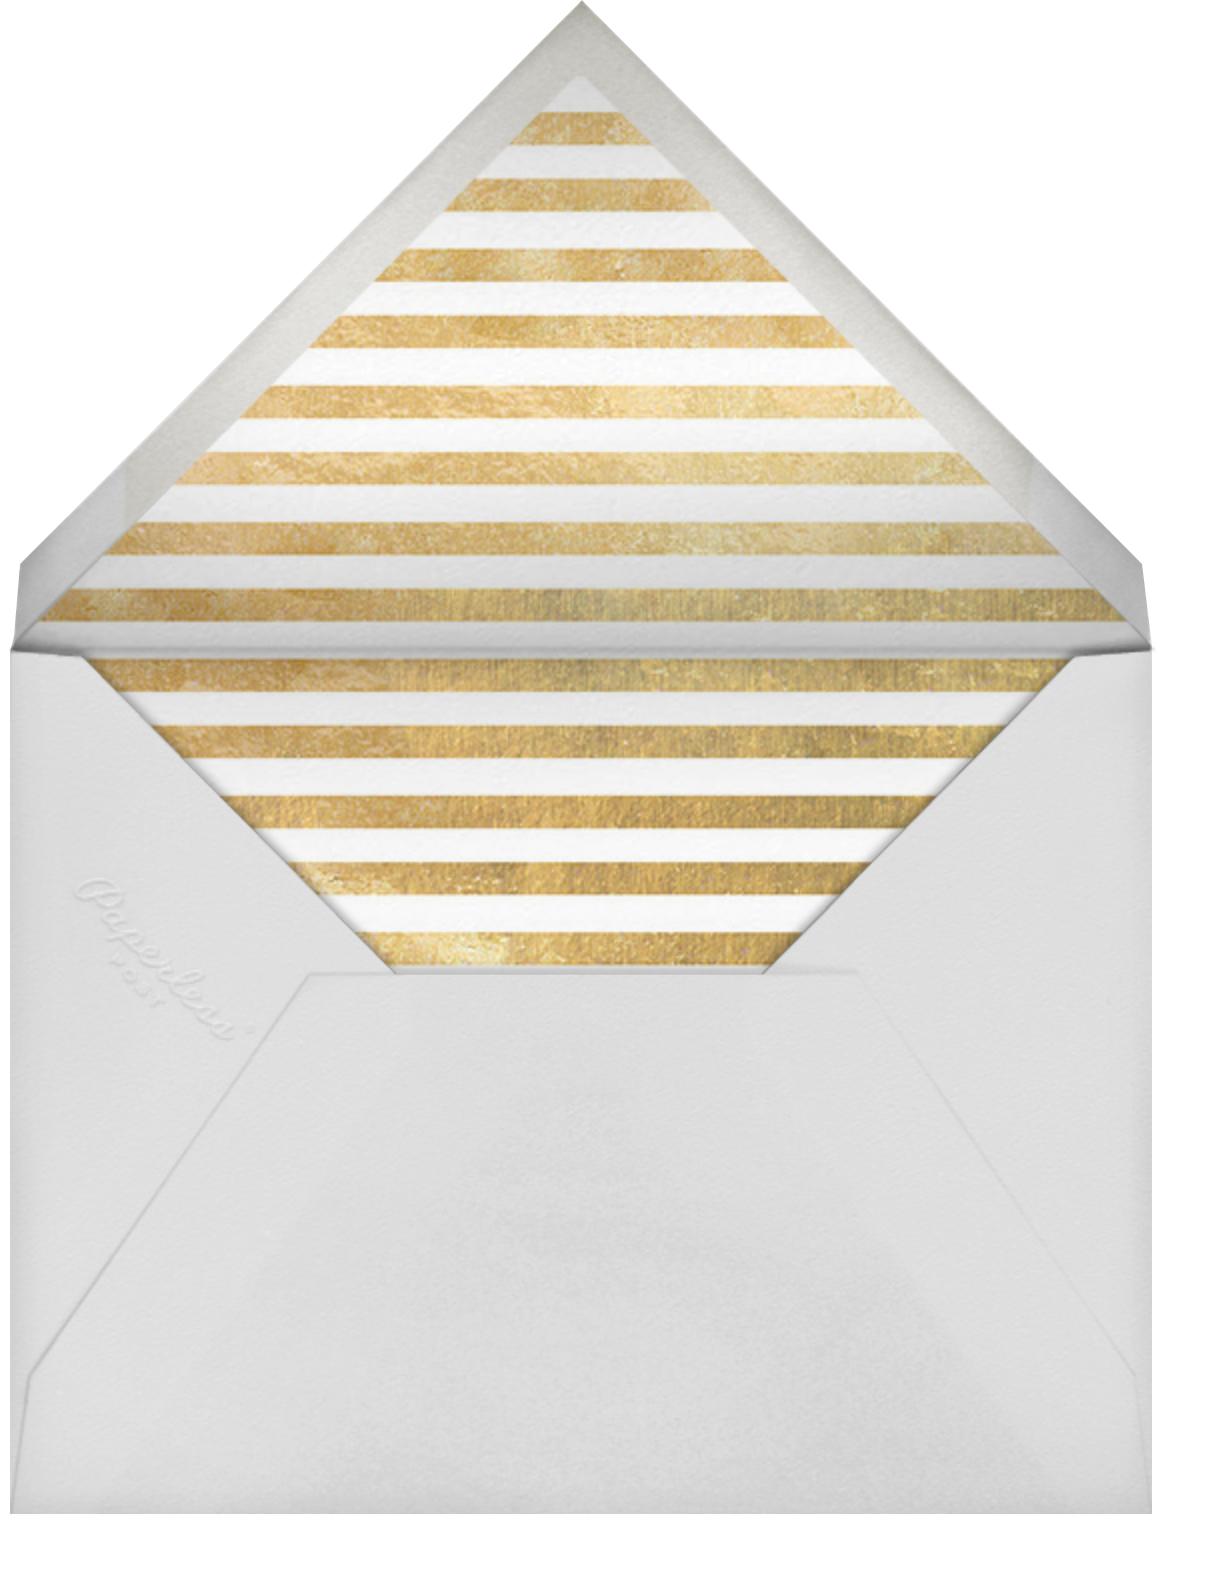 Tassel (Photo) - Gold - kate spade new york - Spring Favorites - envelope back